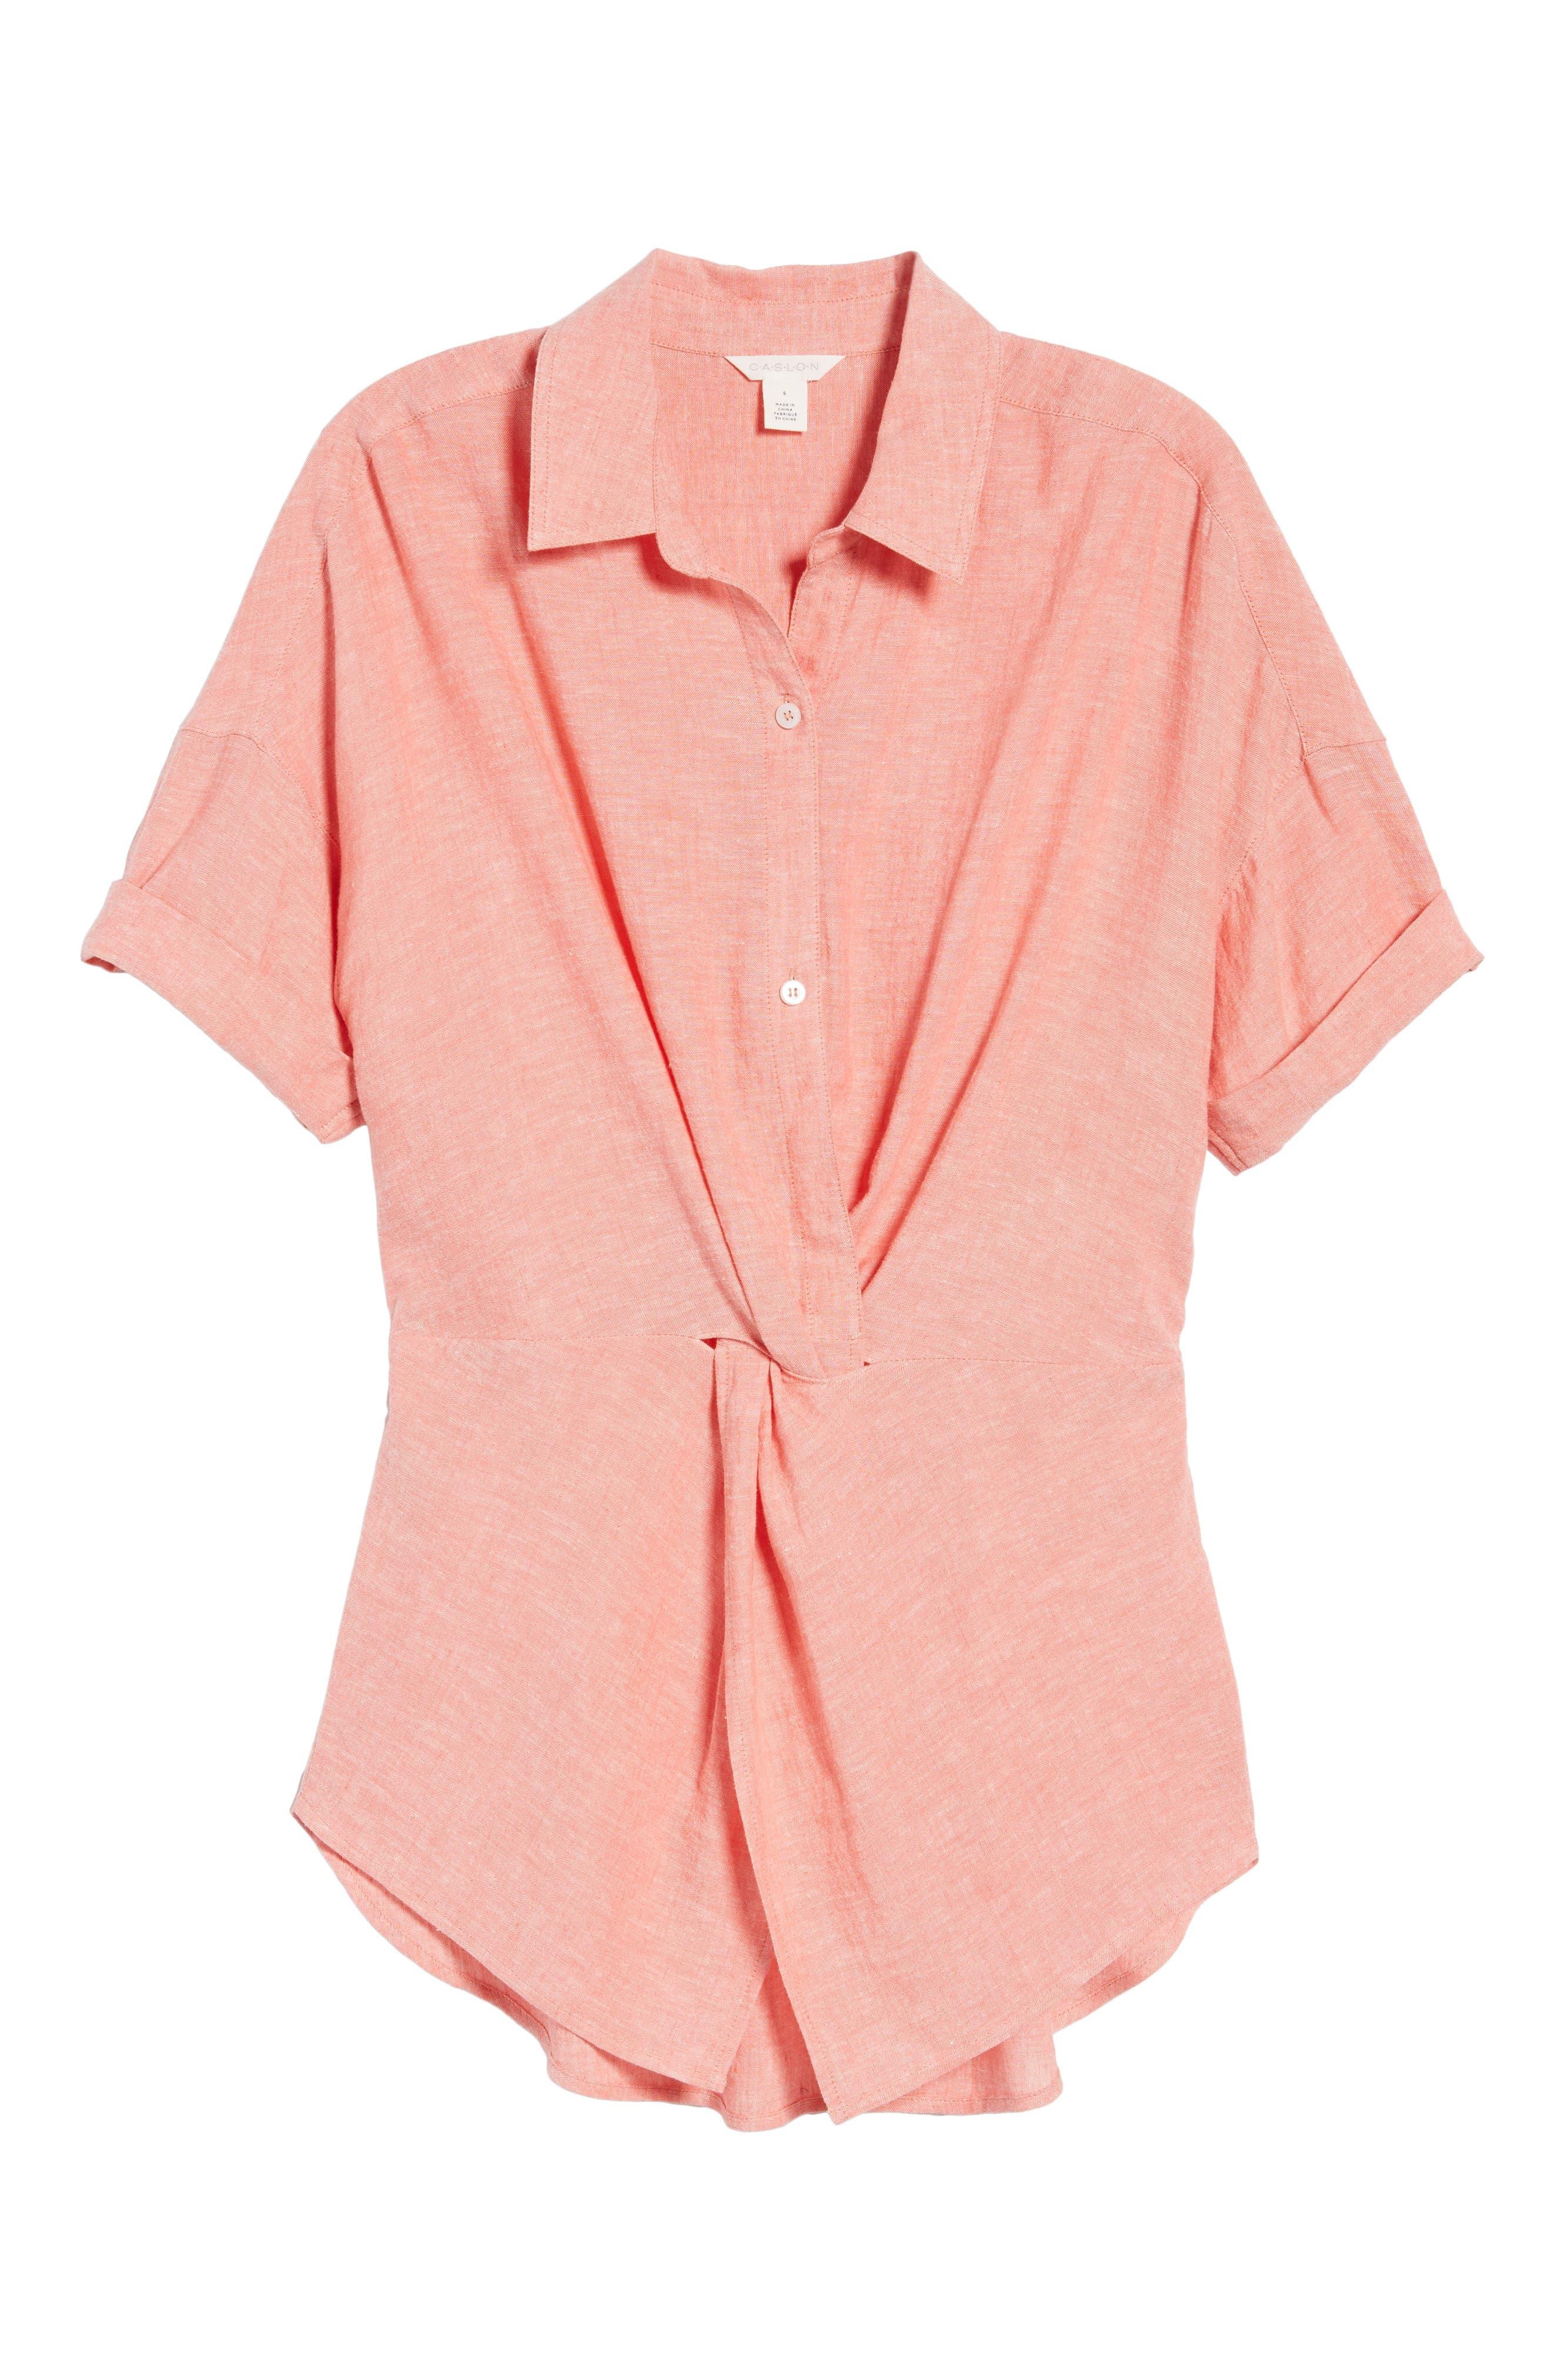 Twist Front Linen Blend Shirt,                             Alternate thumbnail 7, color,                             Coral Rose Crossdye